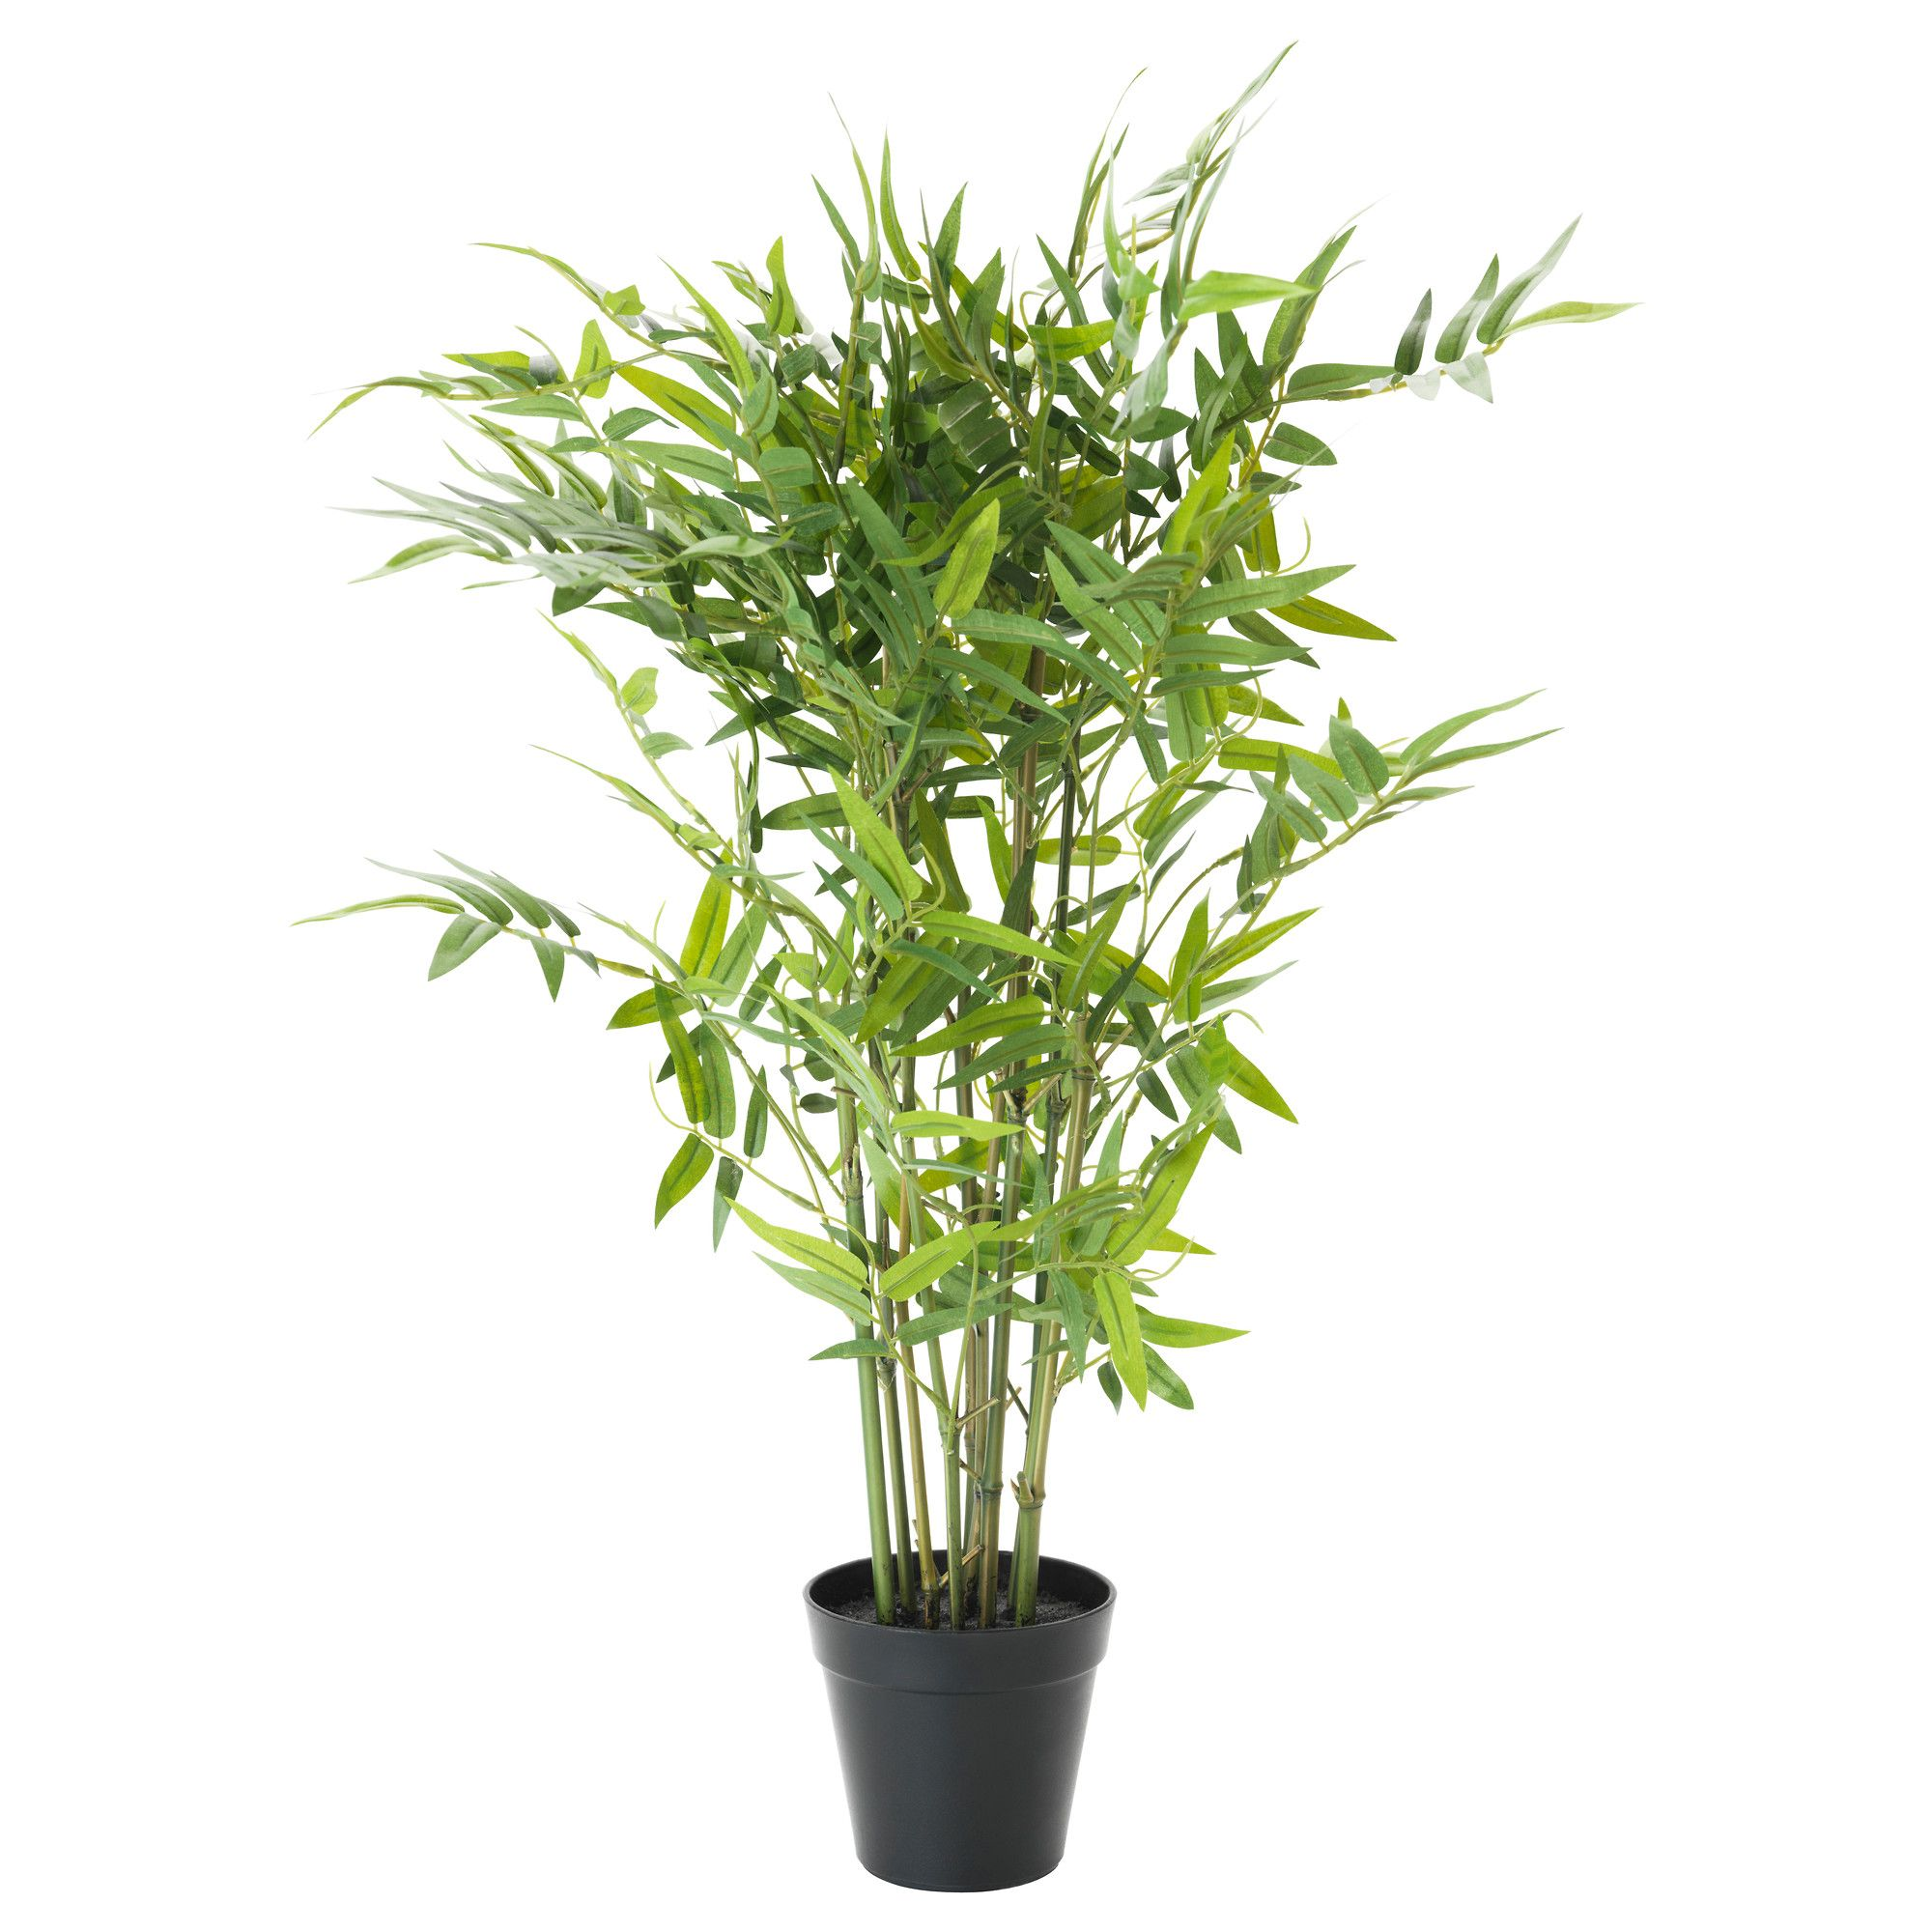 Ikea Nederland Interieur Online Bestellen Artificial Potted Plants Artificial Plants Outdoor Artificial Garden Plants